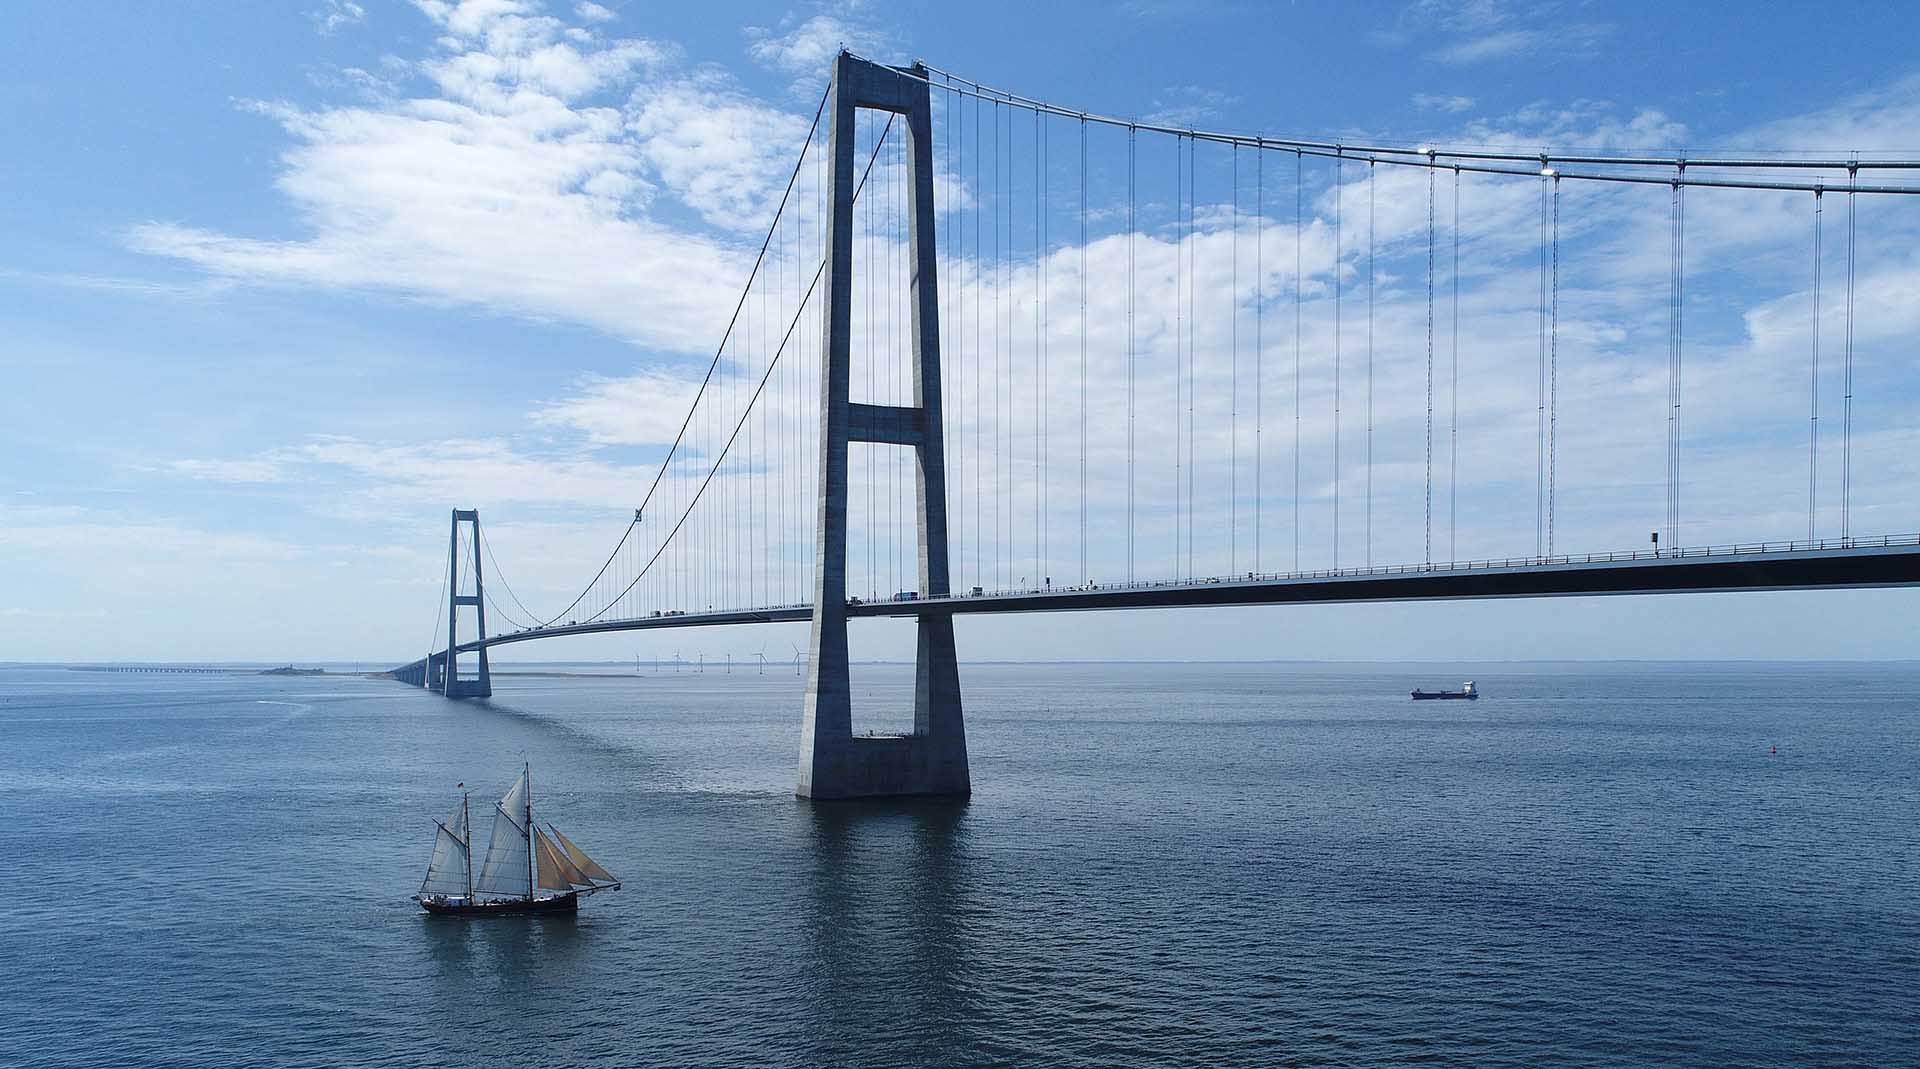 The Great Belt Bridge